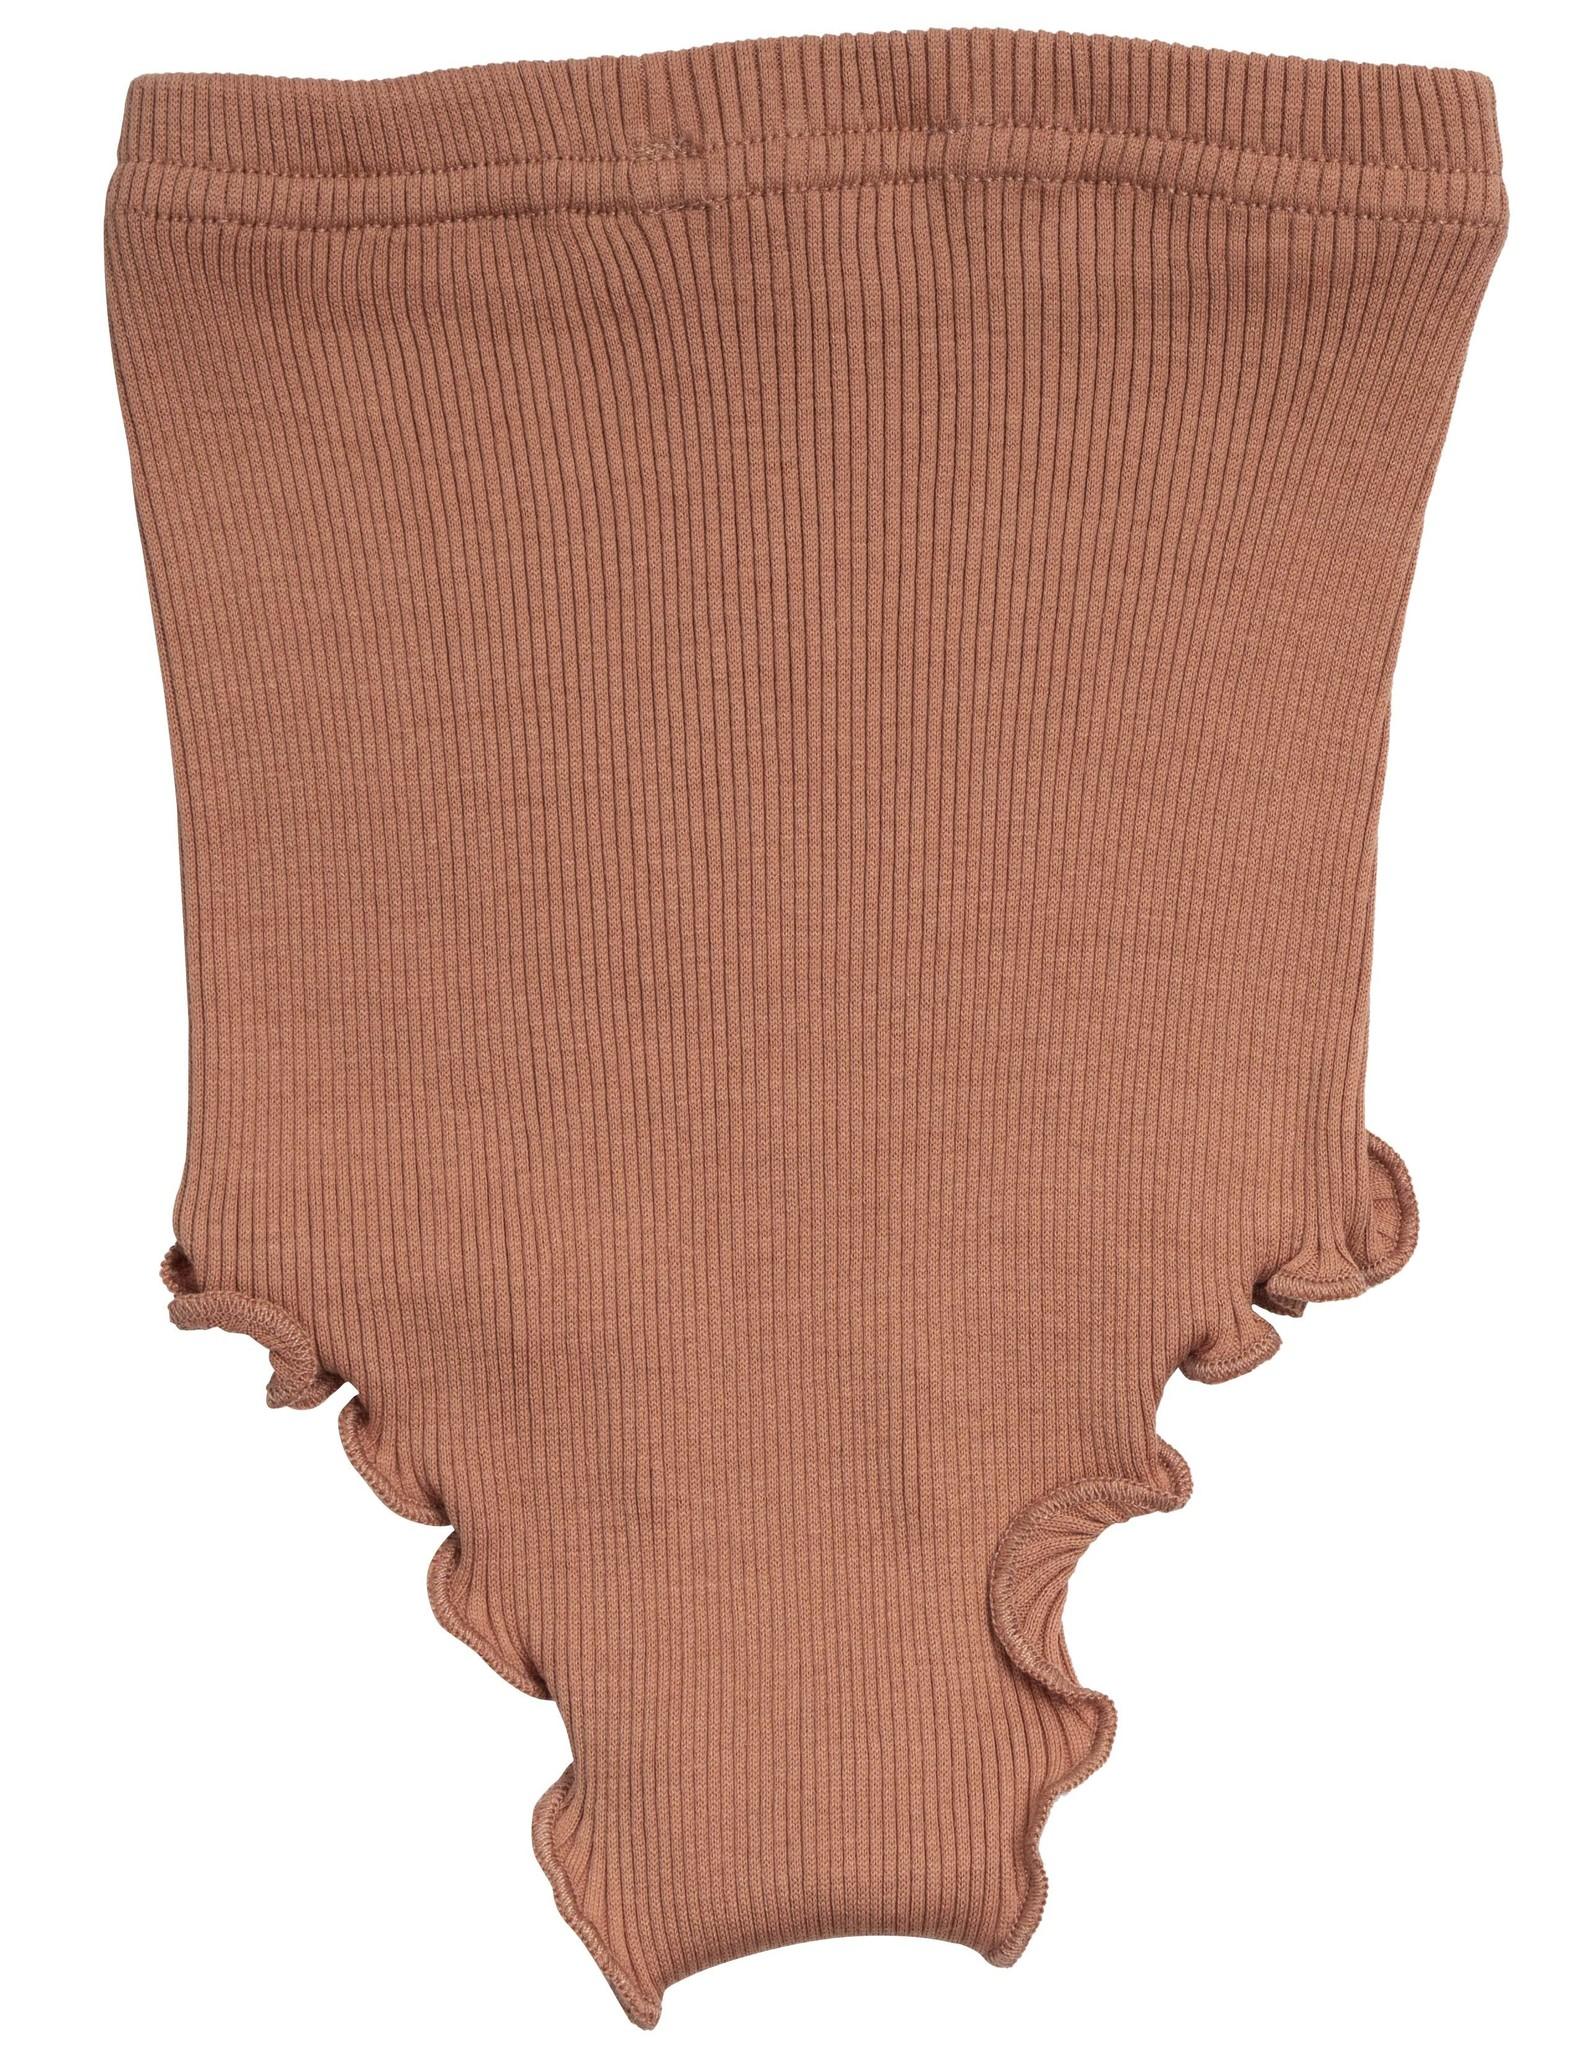 Minimalisma bloomer  BABLA - 70% silk/30% cotton - tan - 1m to 3Y